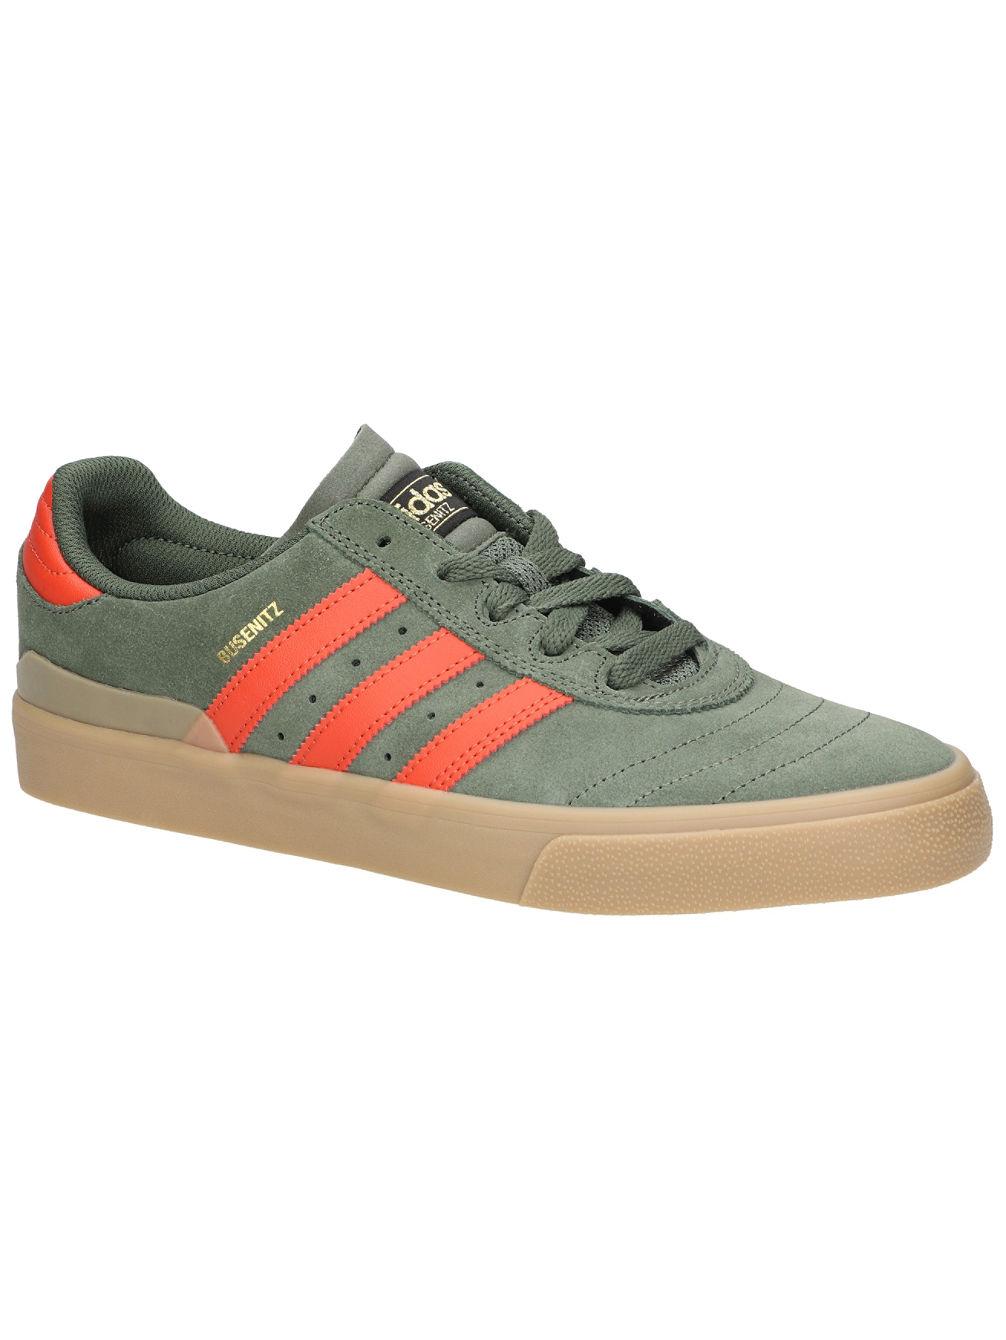 Buy adidas Skateboarding Busenitz Vulc Skate Shoes online at blue-tomato.com ebe4b69e9fd